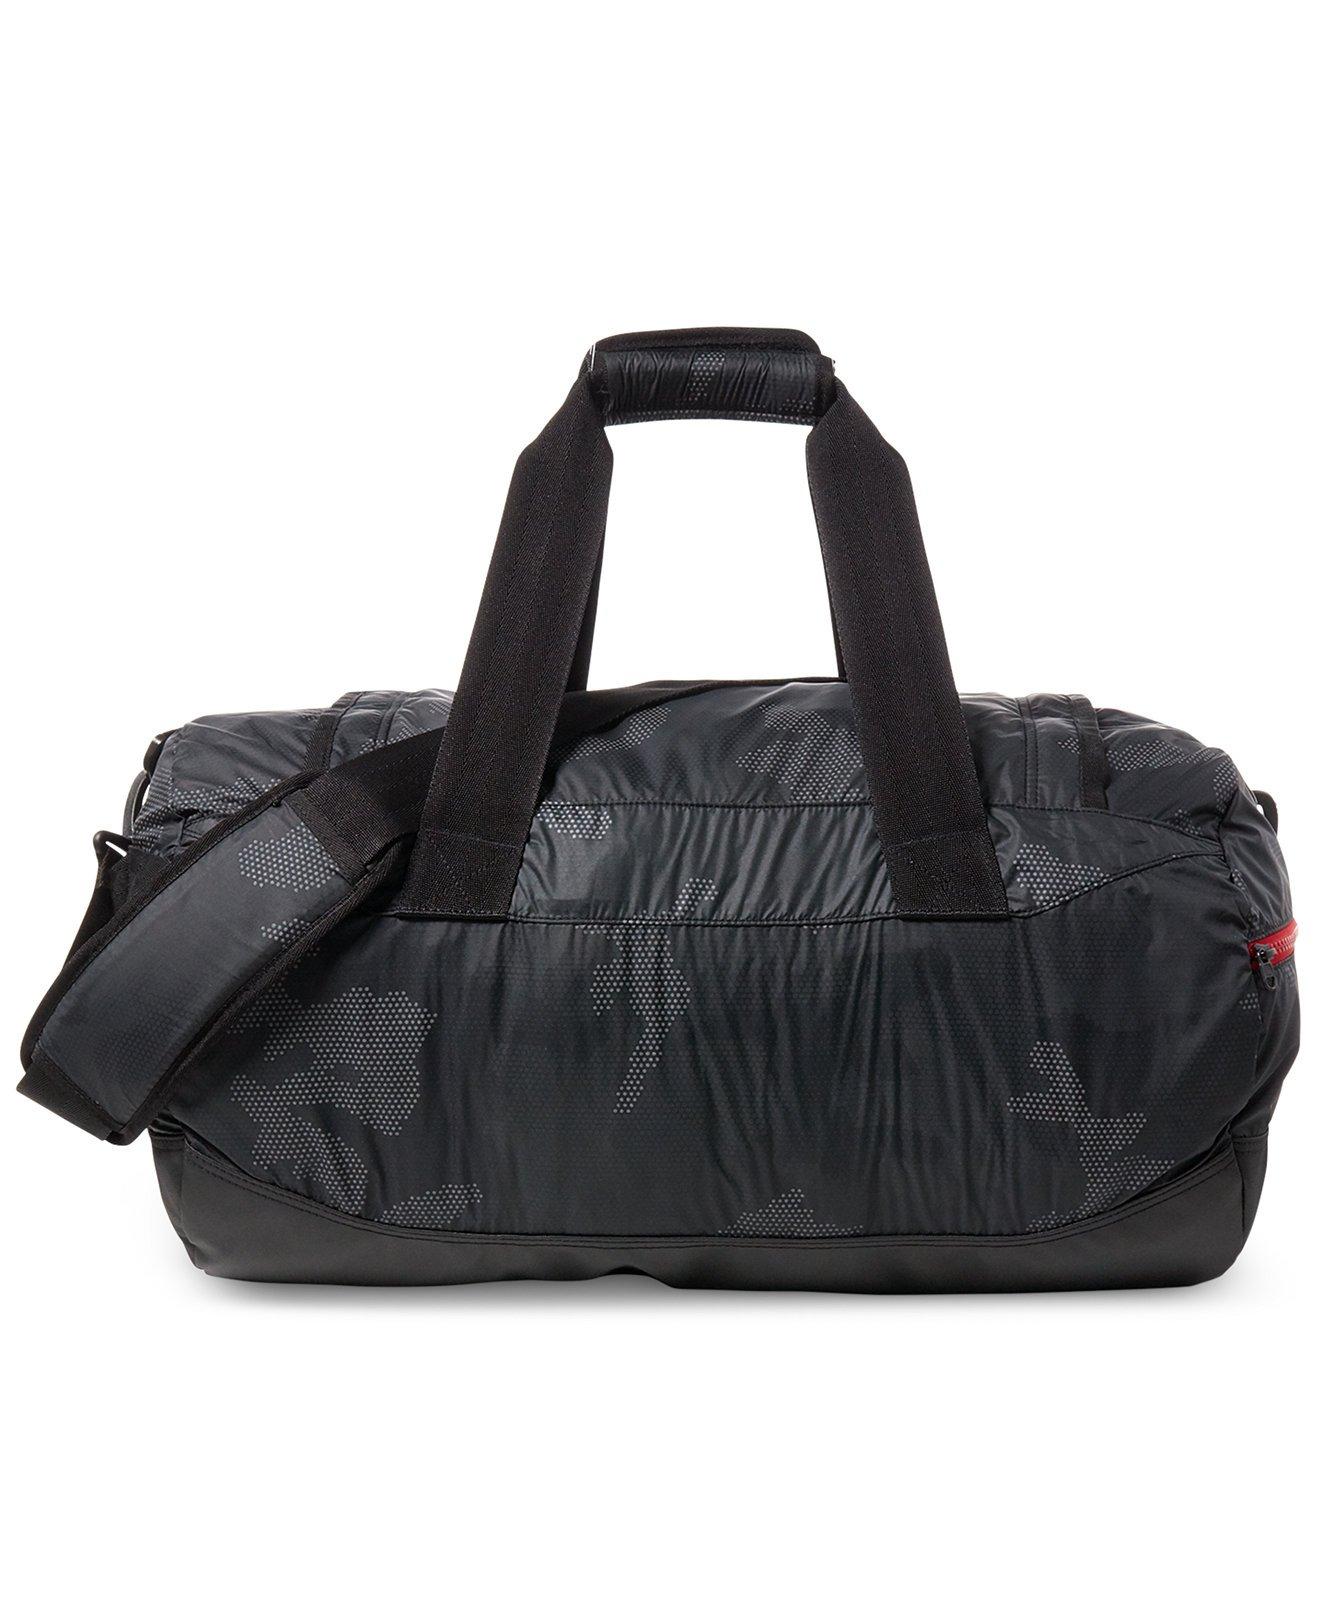 Polo Ralph Lauren NEW Black Men s Nylon Large Double Zip Duffle Bag -  Walmart.com 17f87c7a89864